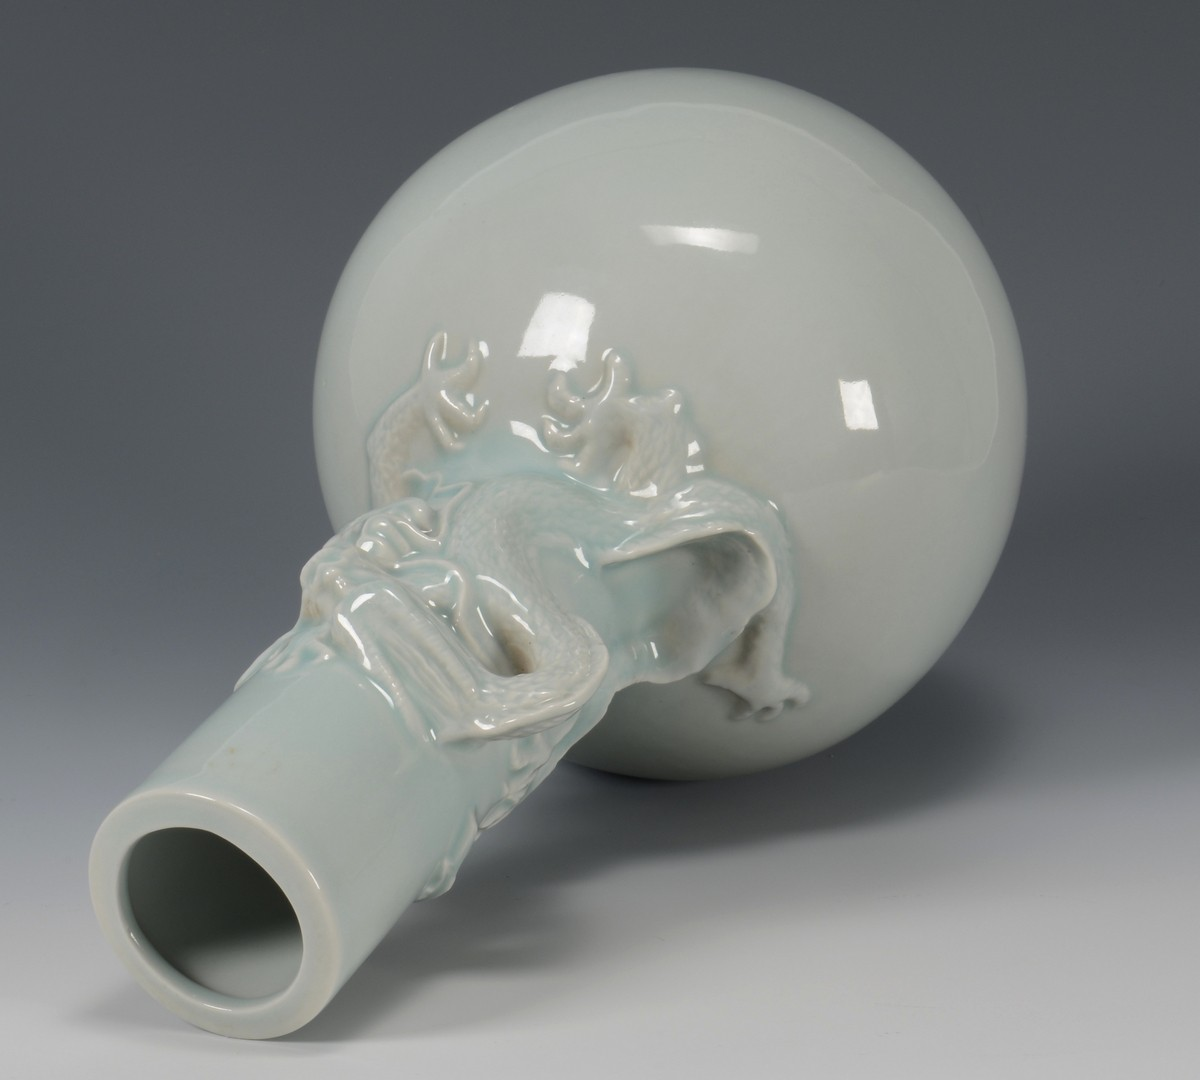 Lot 3594221: Chinese Monochrome Vase w/ Dragon